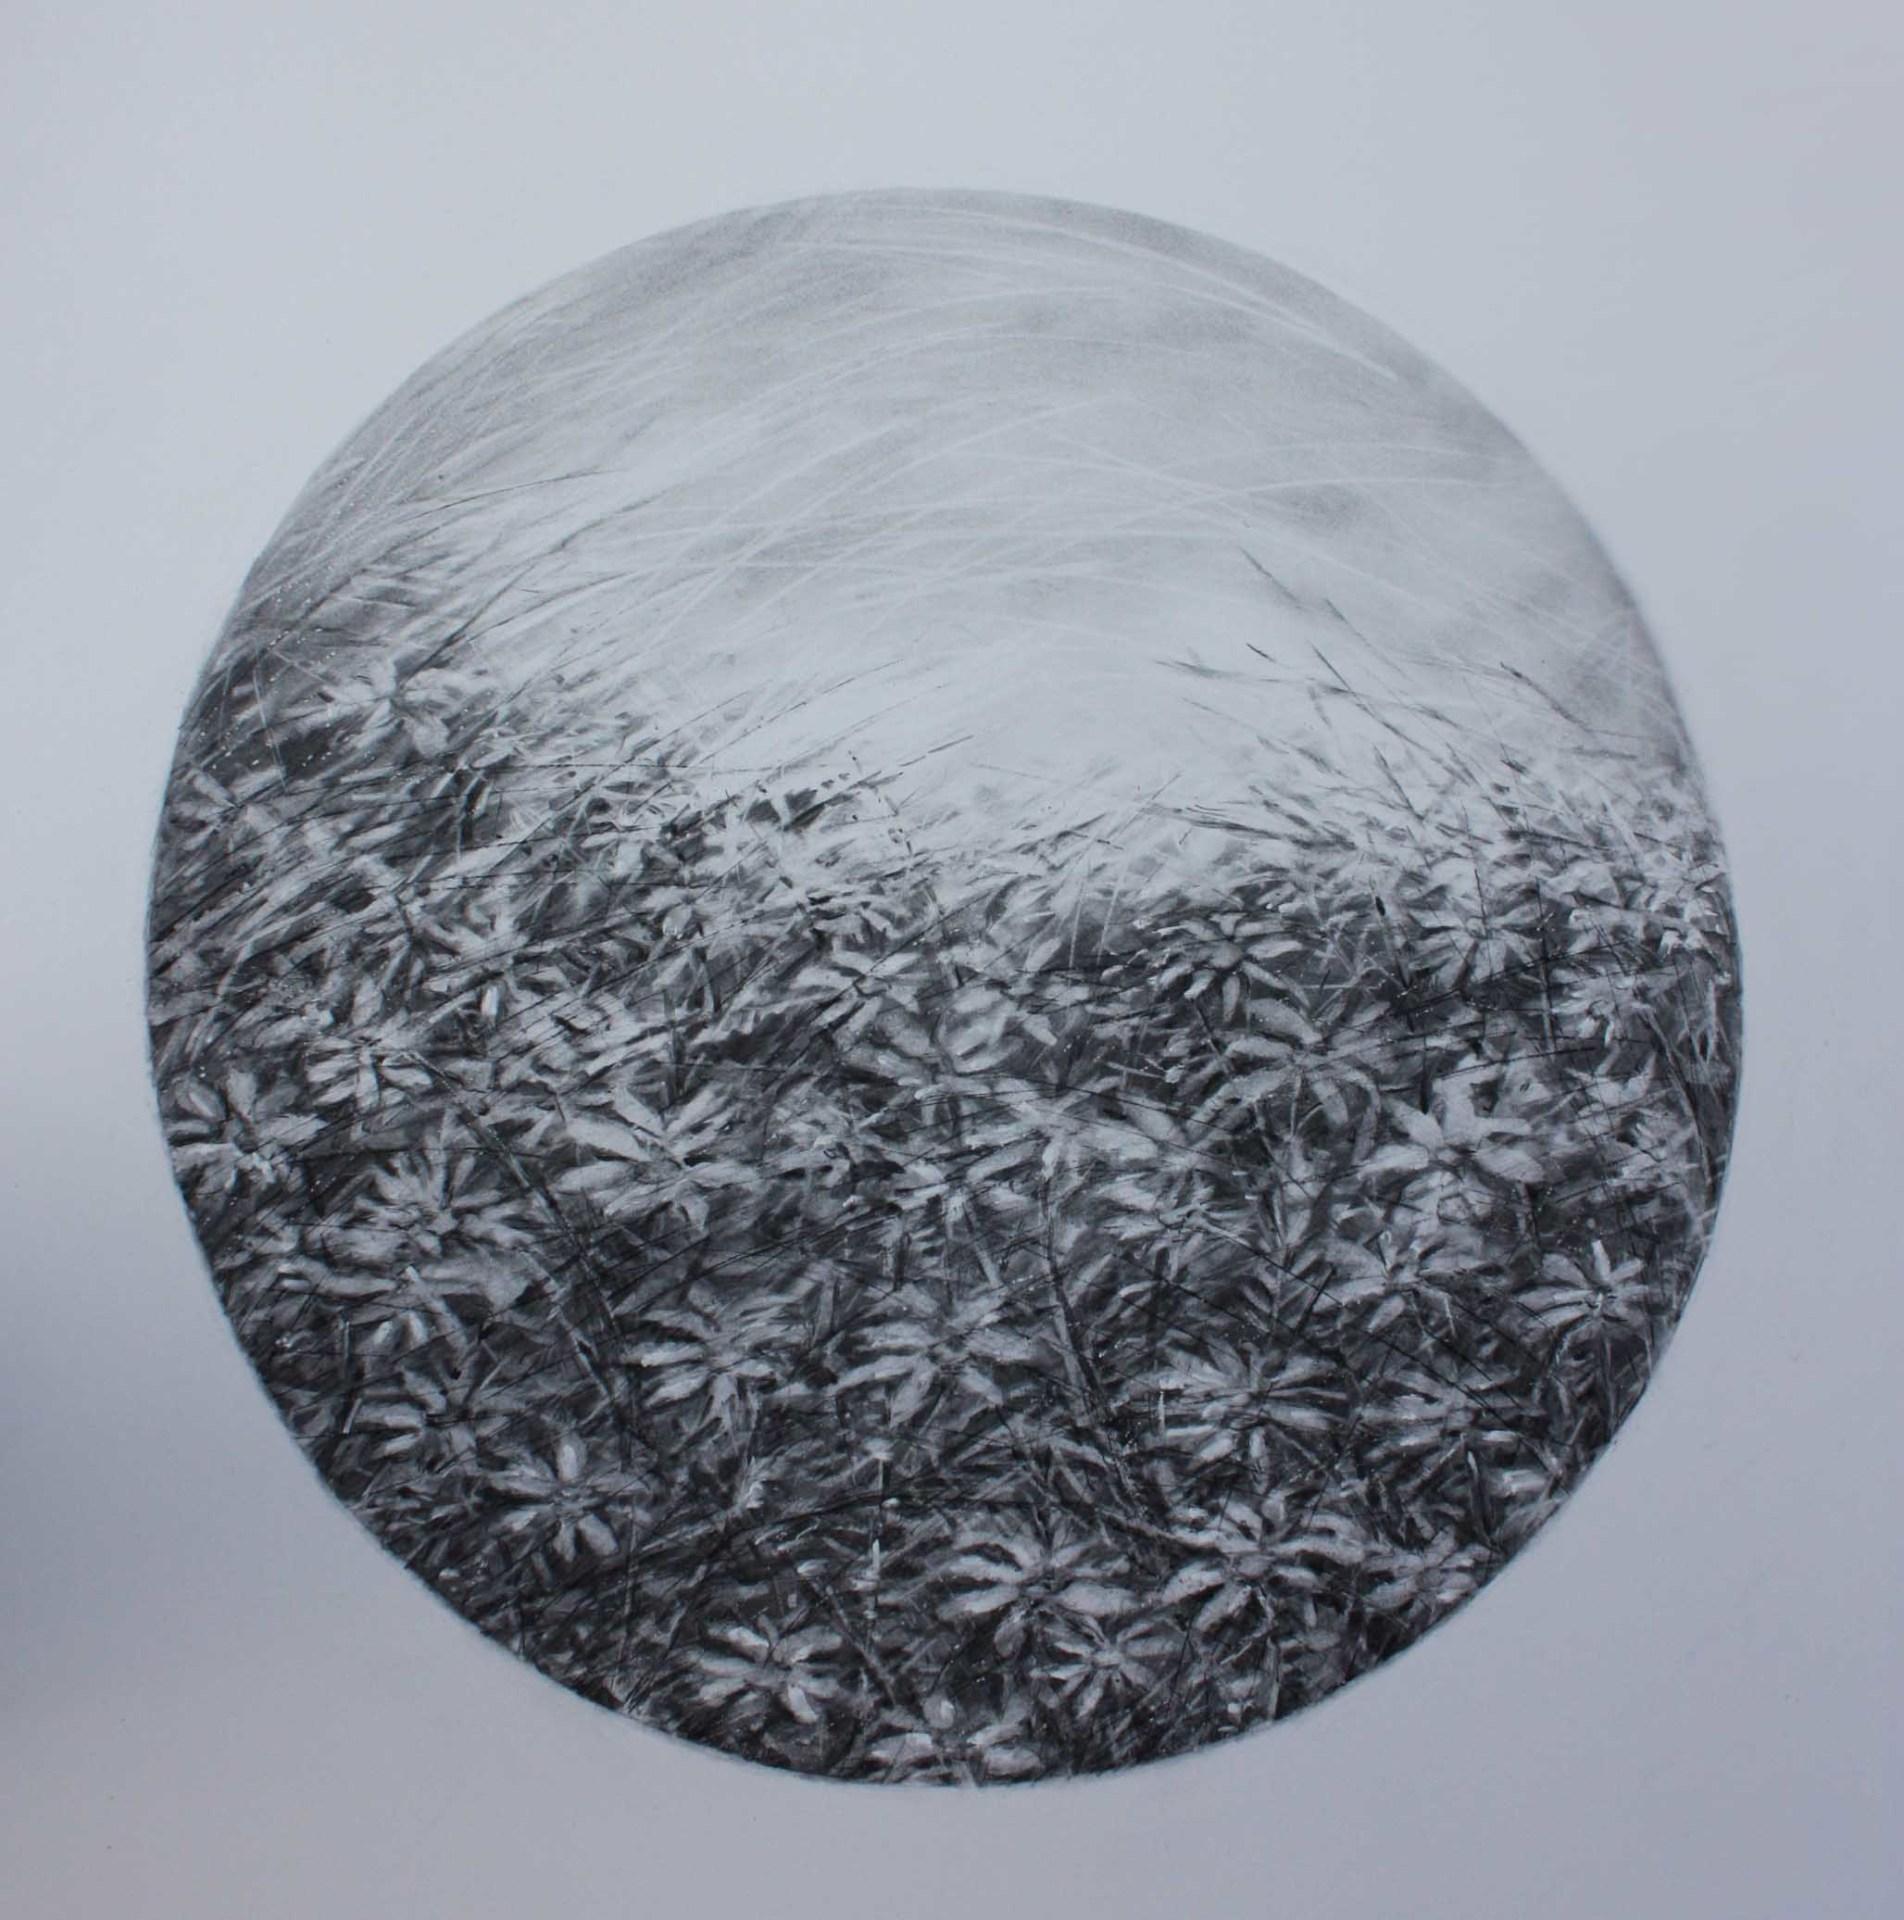 Daisies in circle